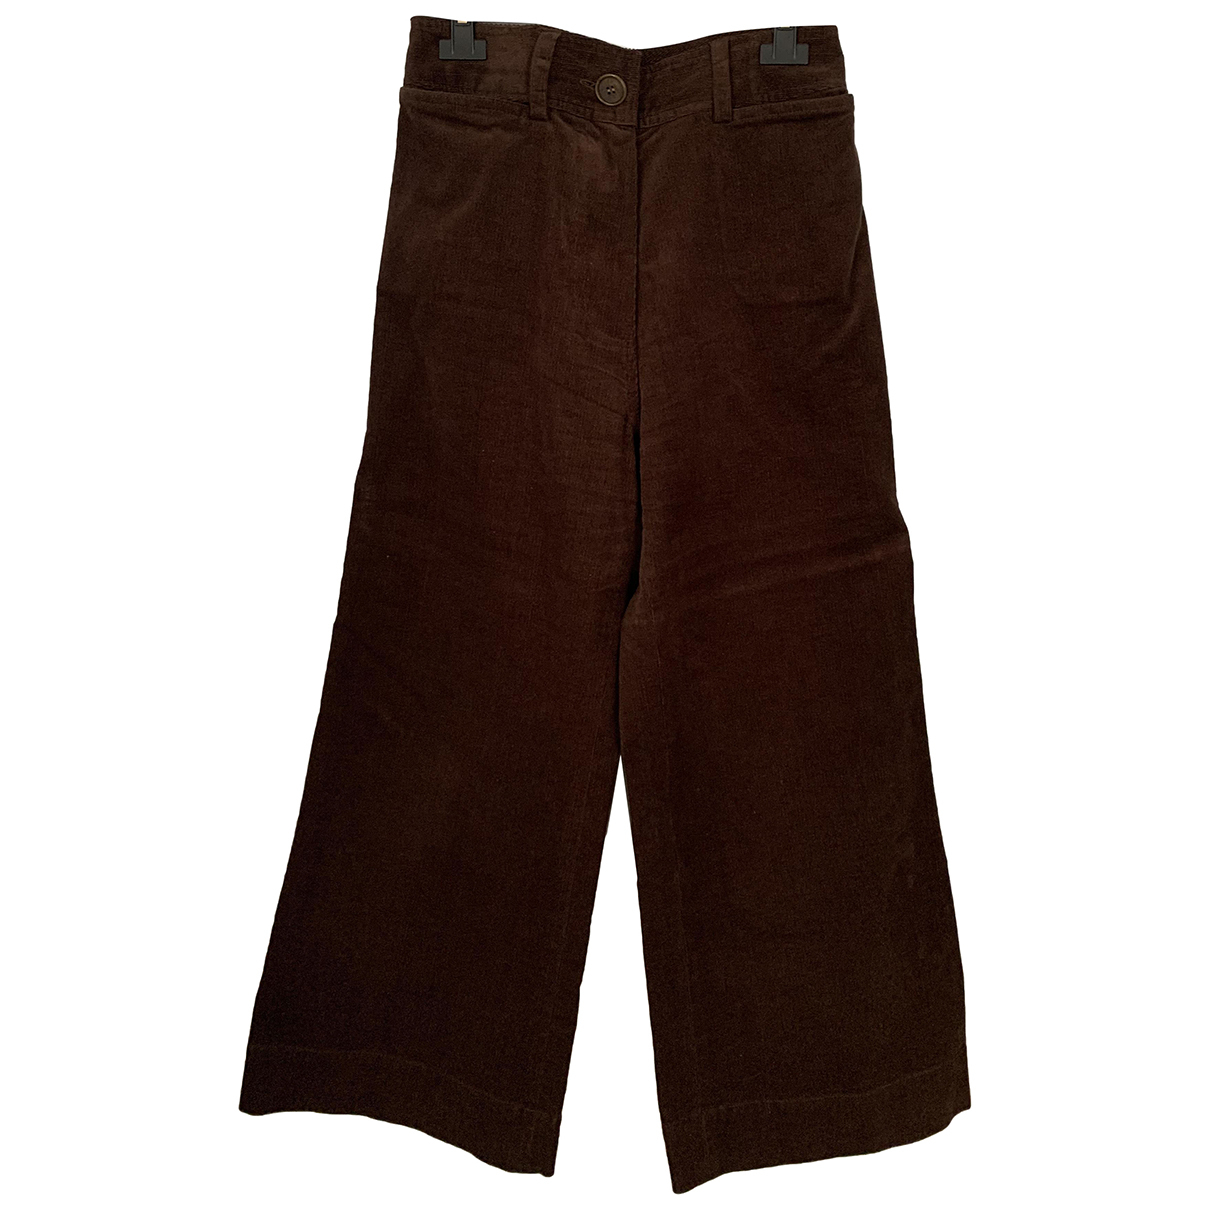 Nathalie Dumeix N Brown Cotton Trousers for Women 40 FR